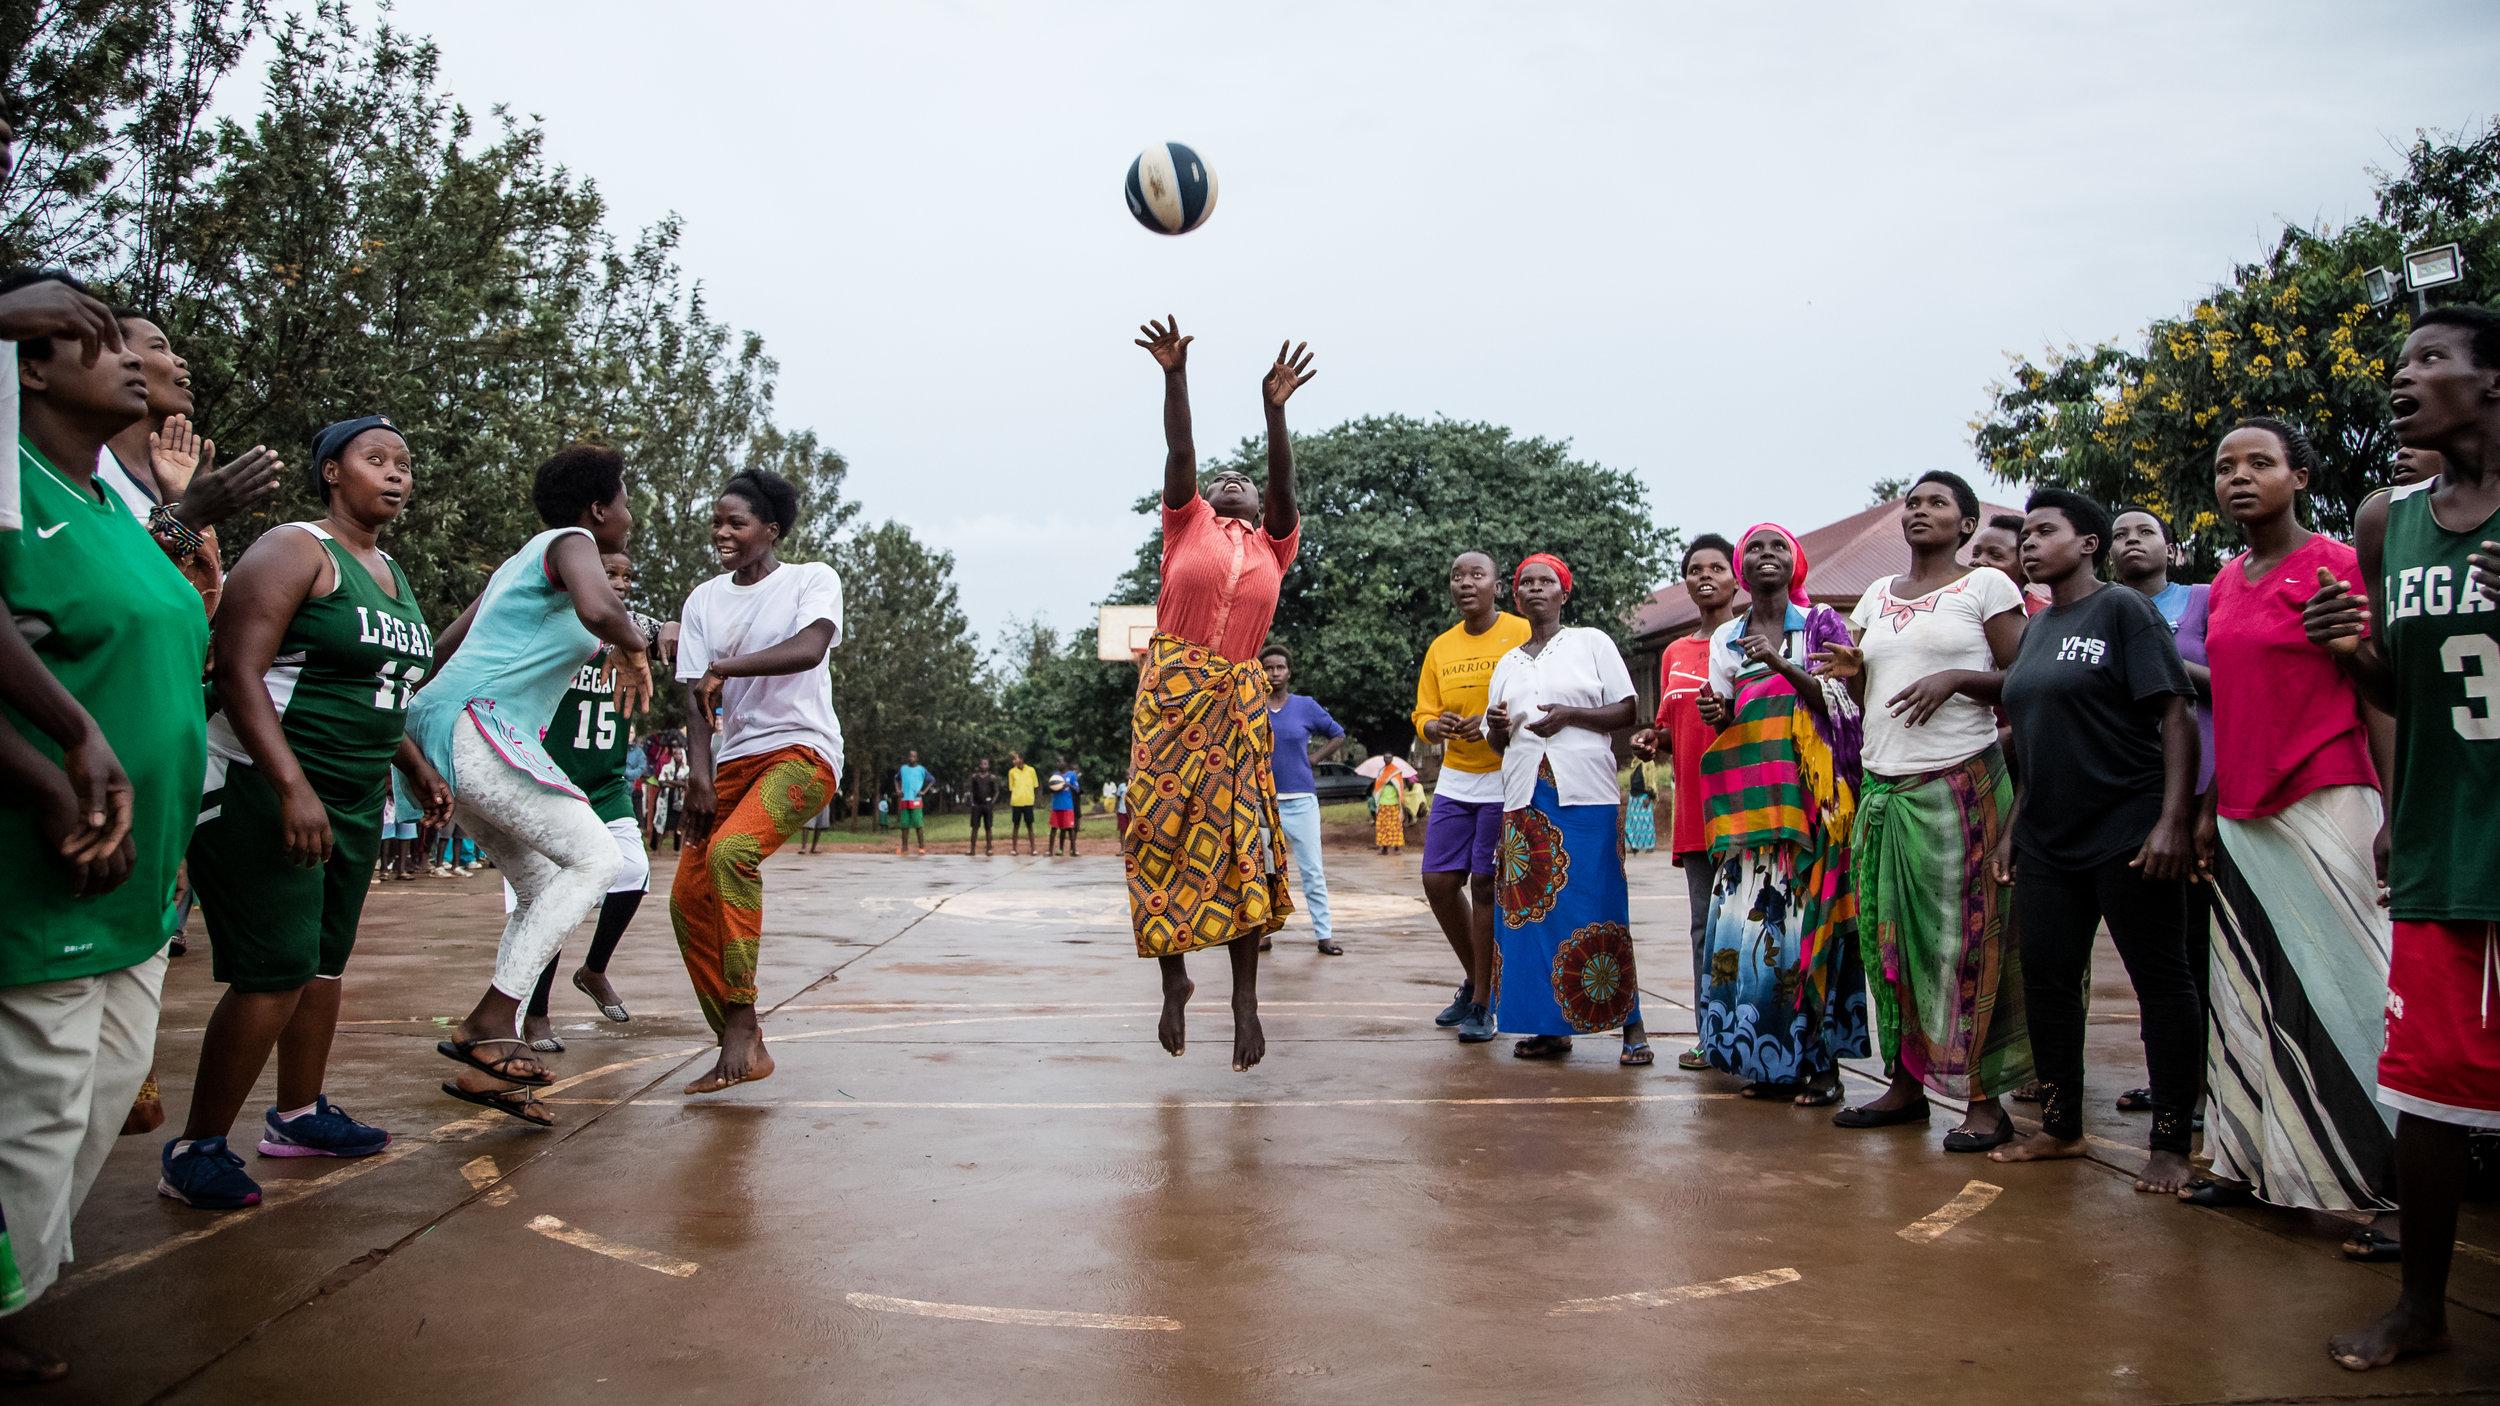 Women's practice in Rwinkwavu before the big International Women's Day tournament.